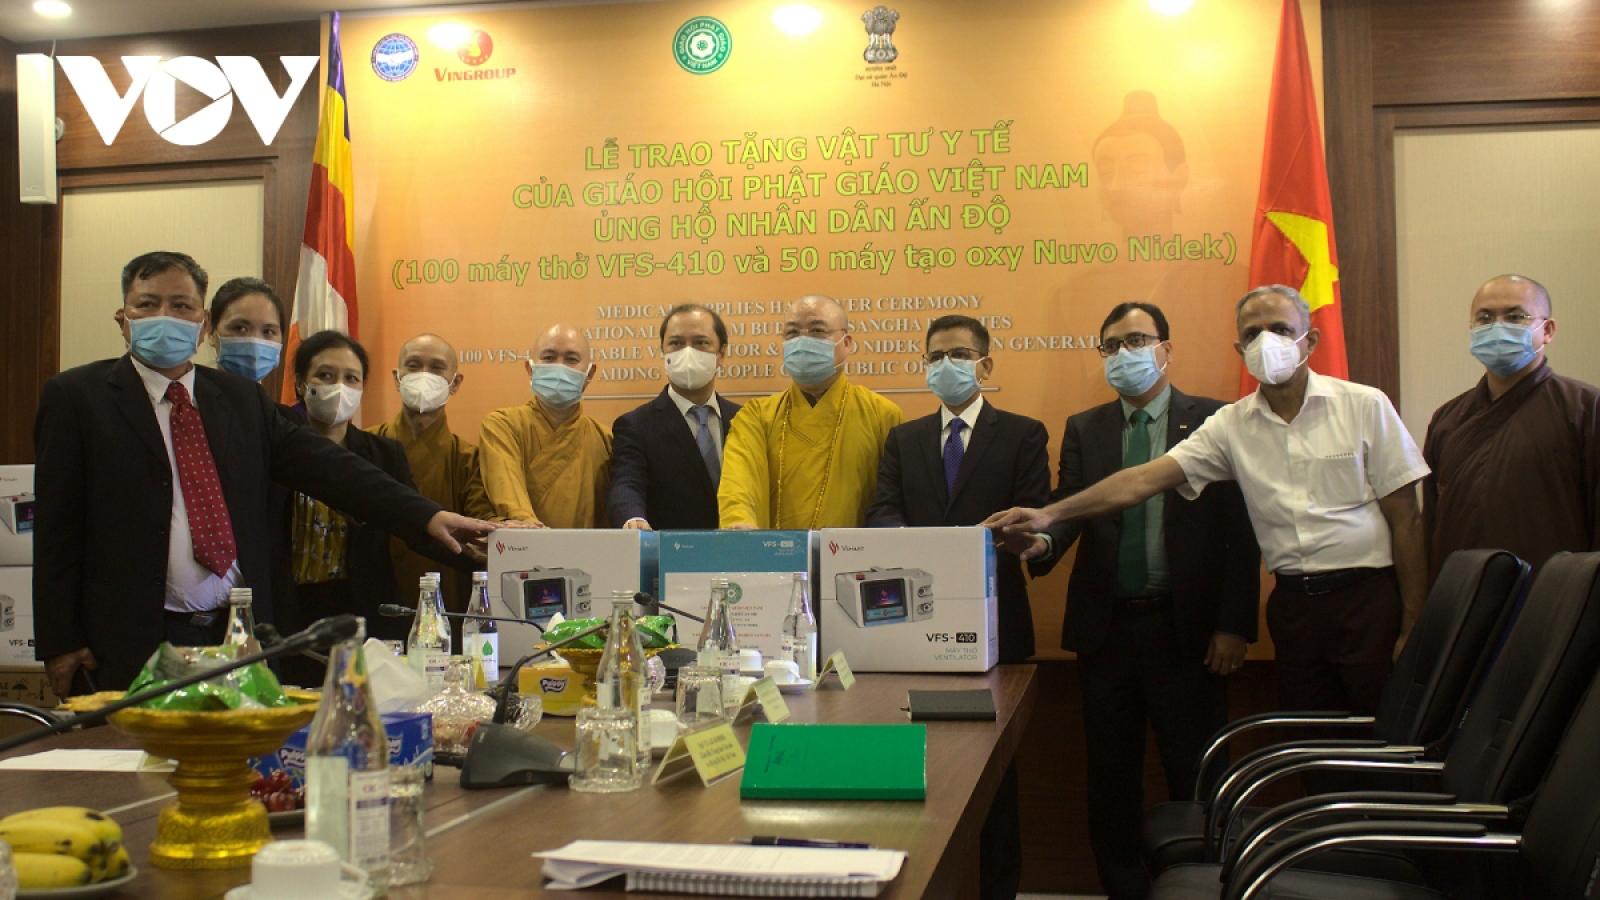 Vietnam Buddhists present ventilators to India for COVID-19 fight